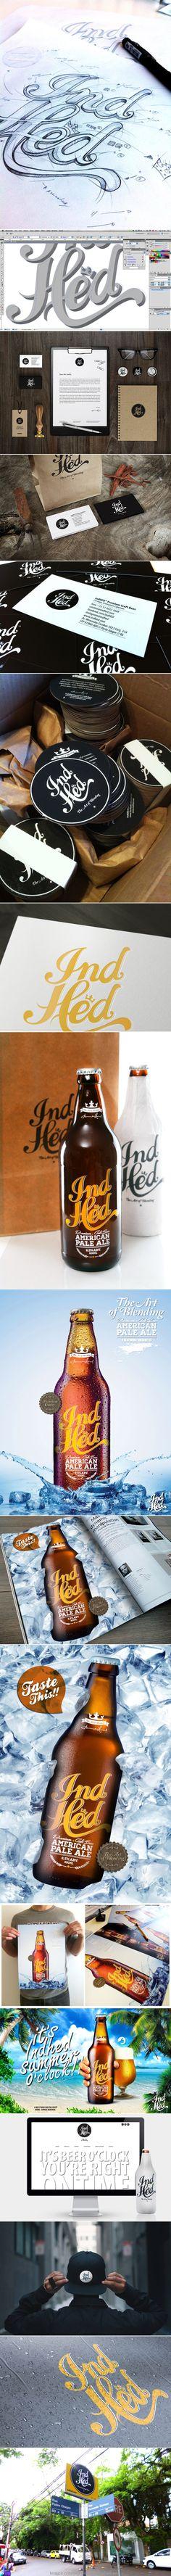 IndHed Premium Craft Beer Branding